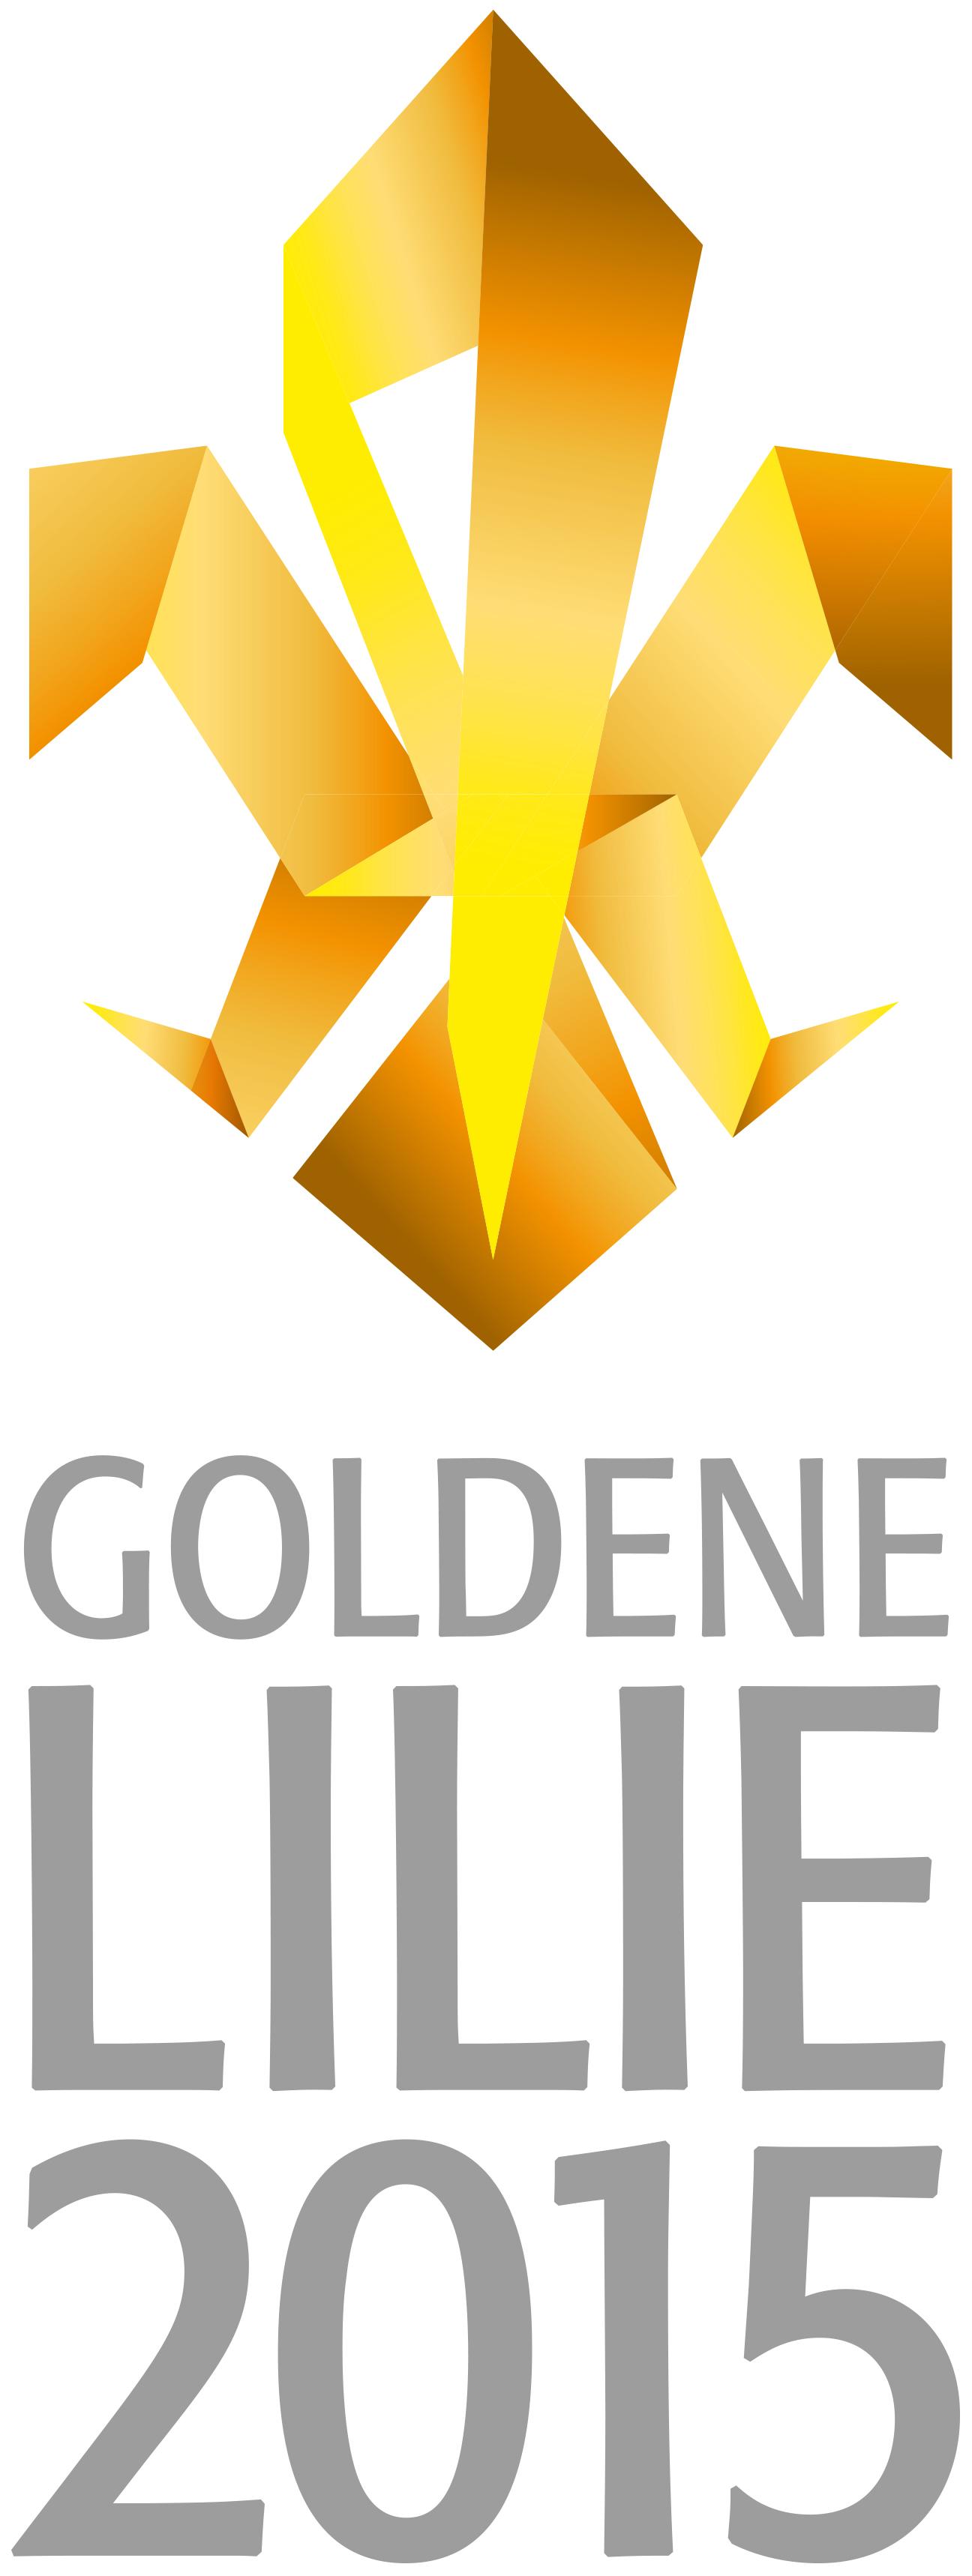 GoldeneLilie2015